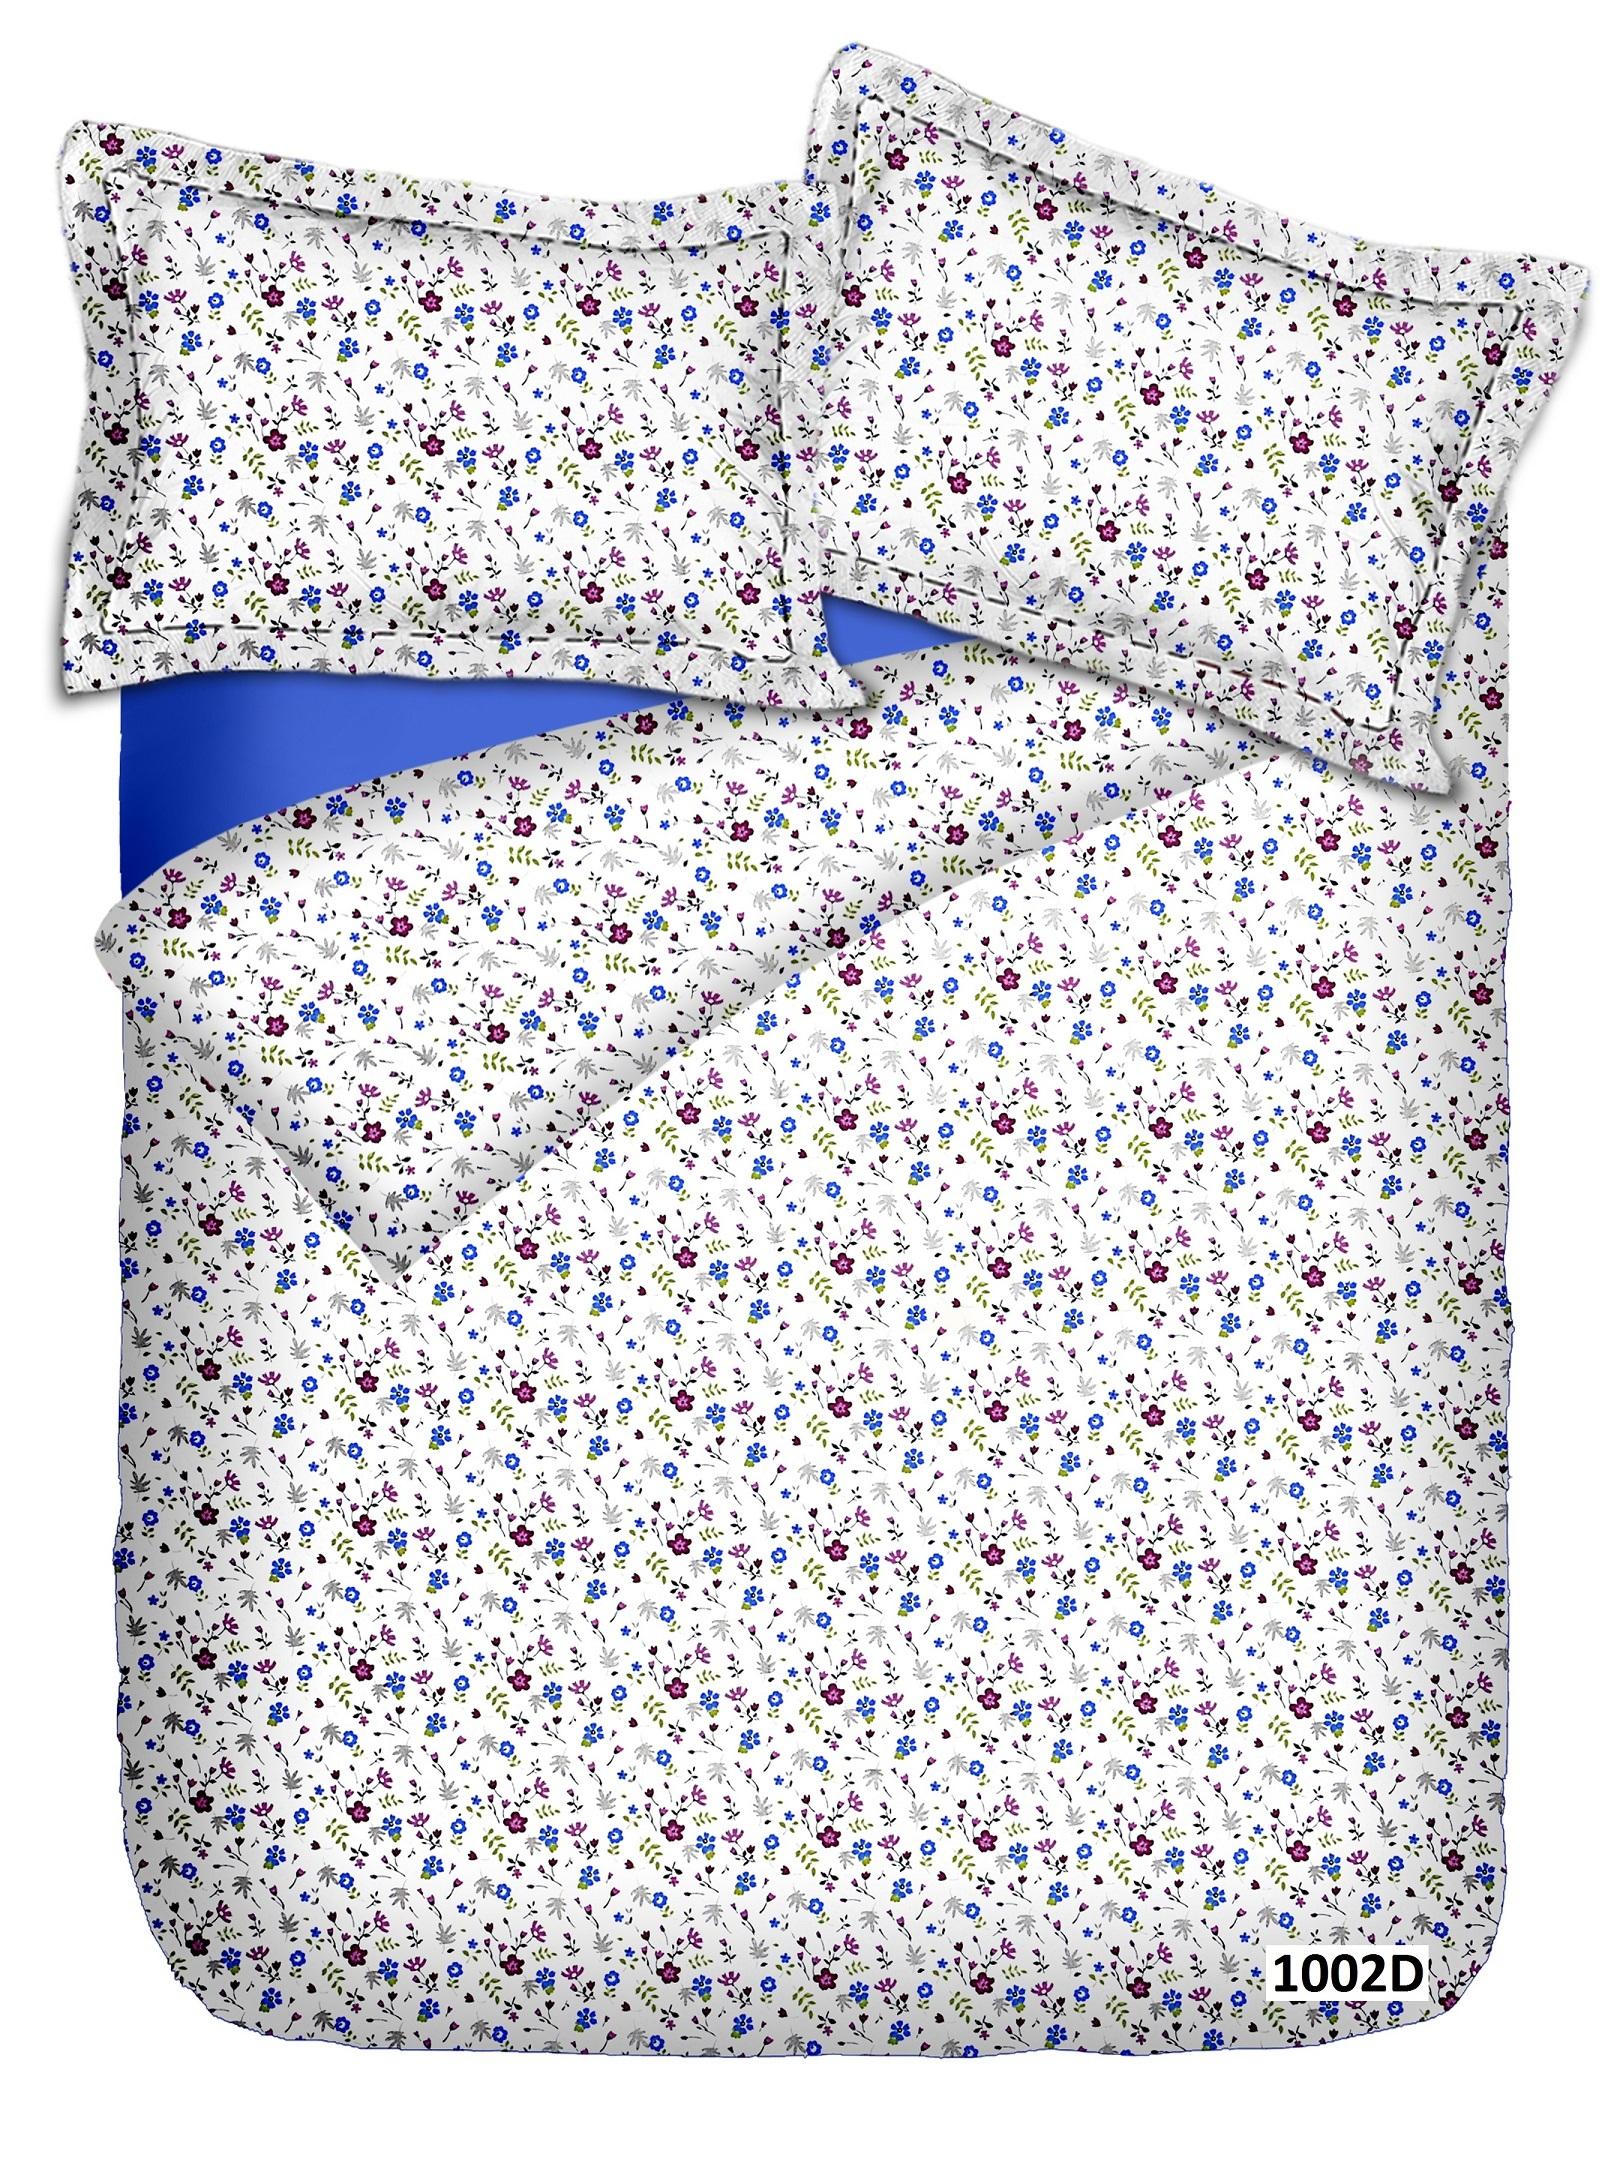 Cotton Printed Bed SheetBedsheet